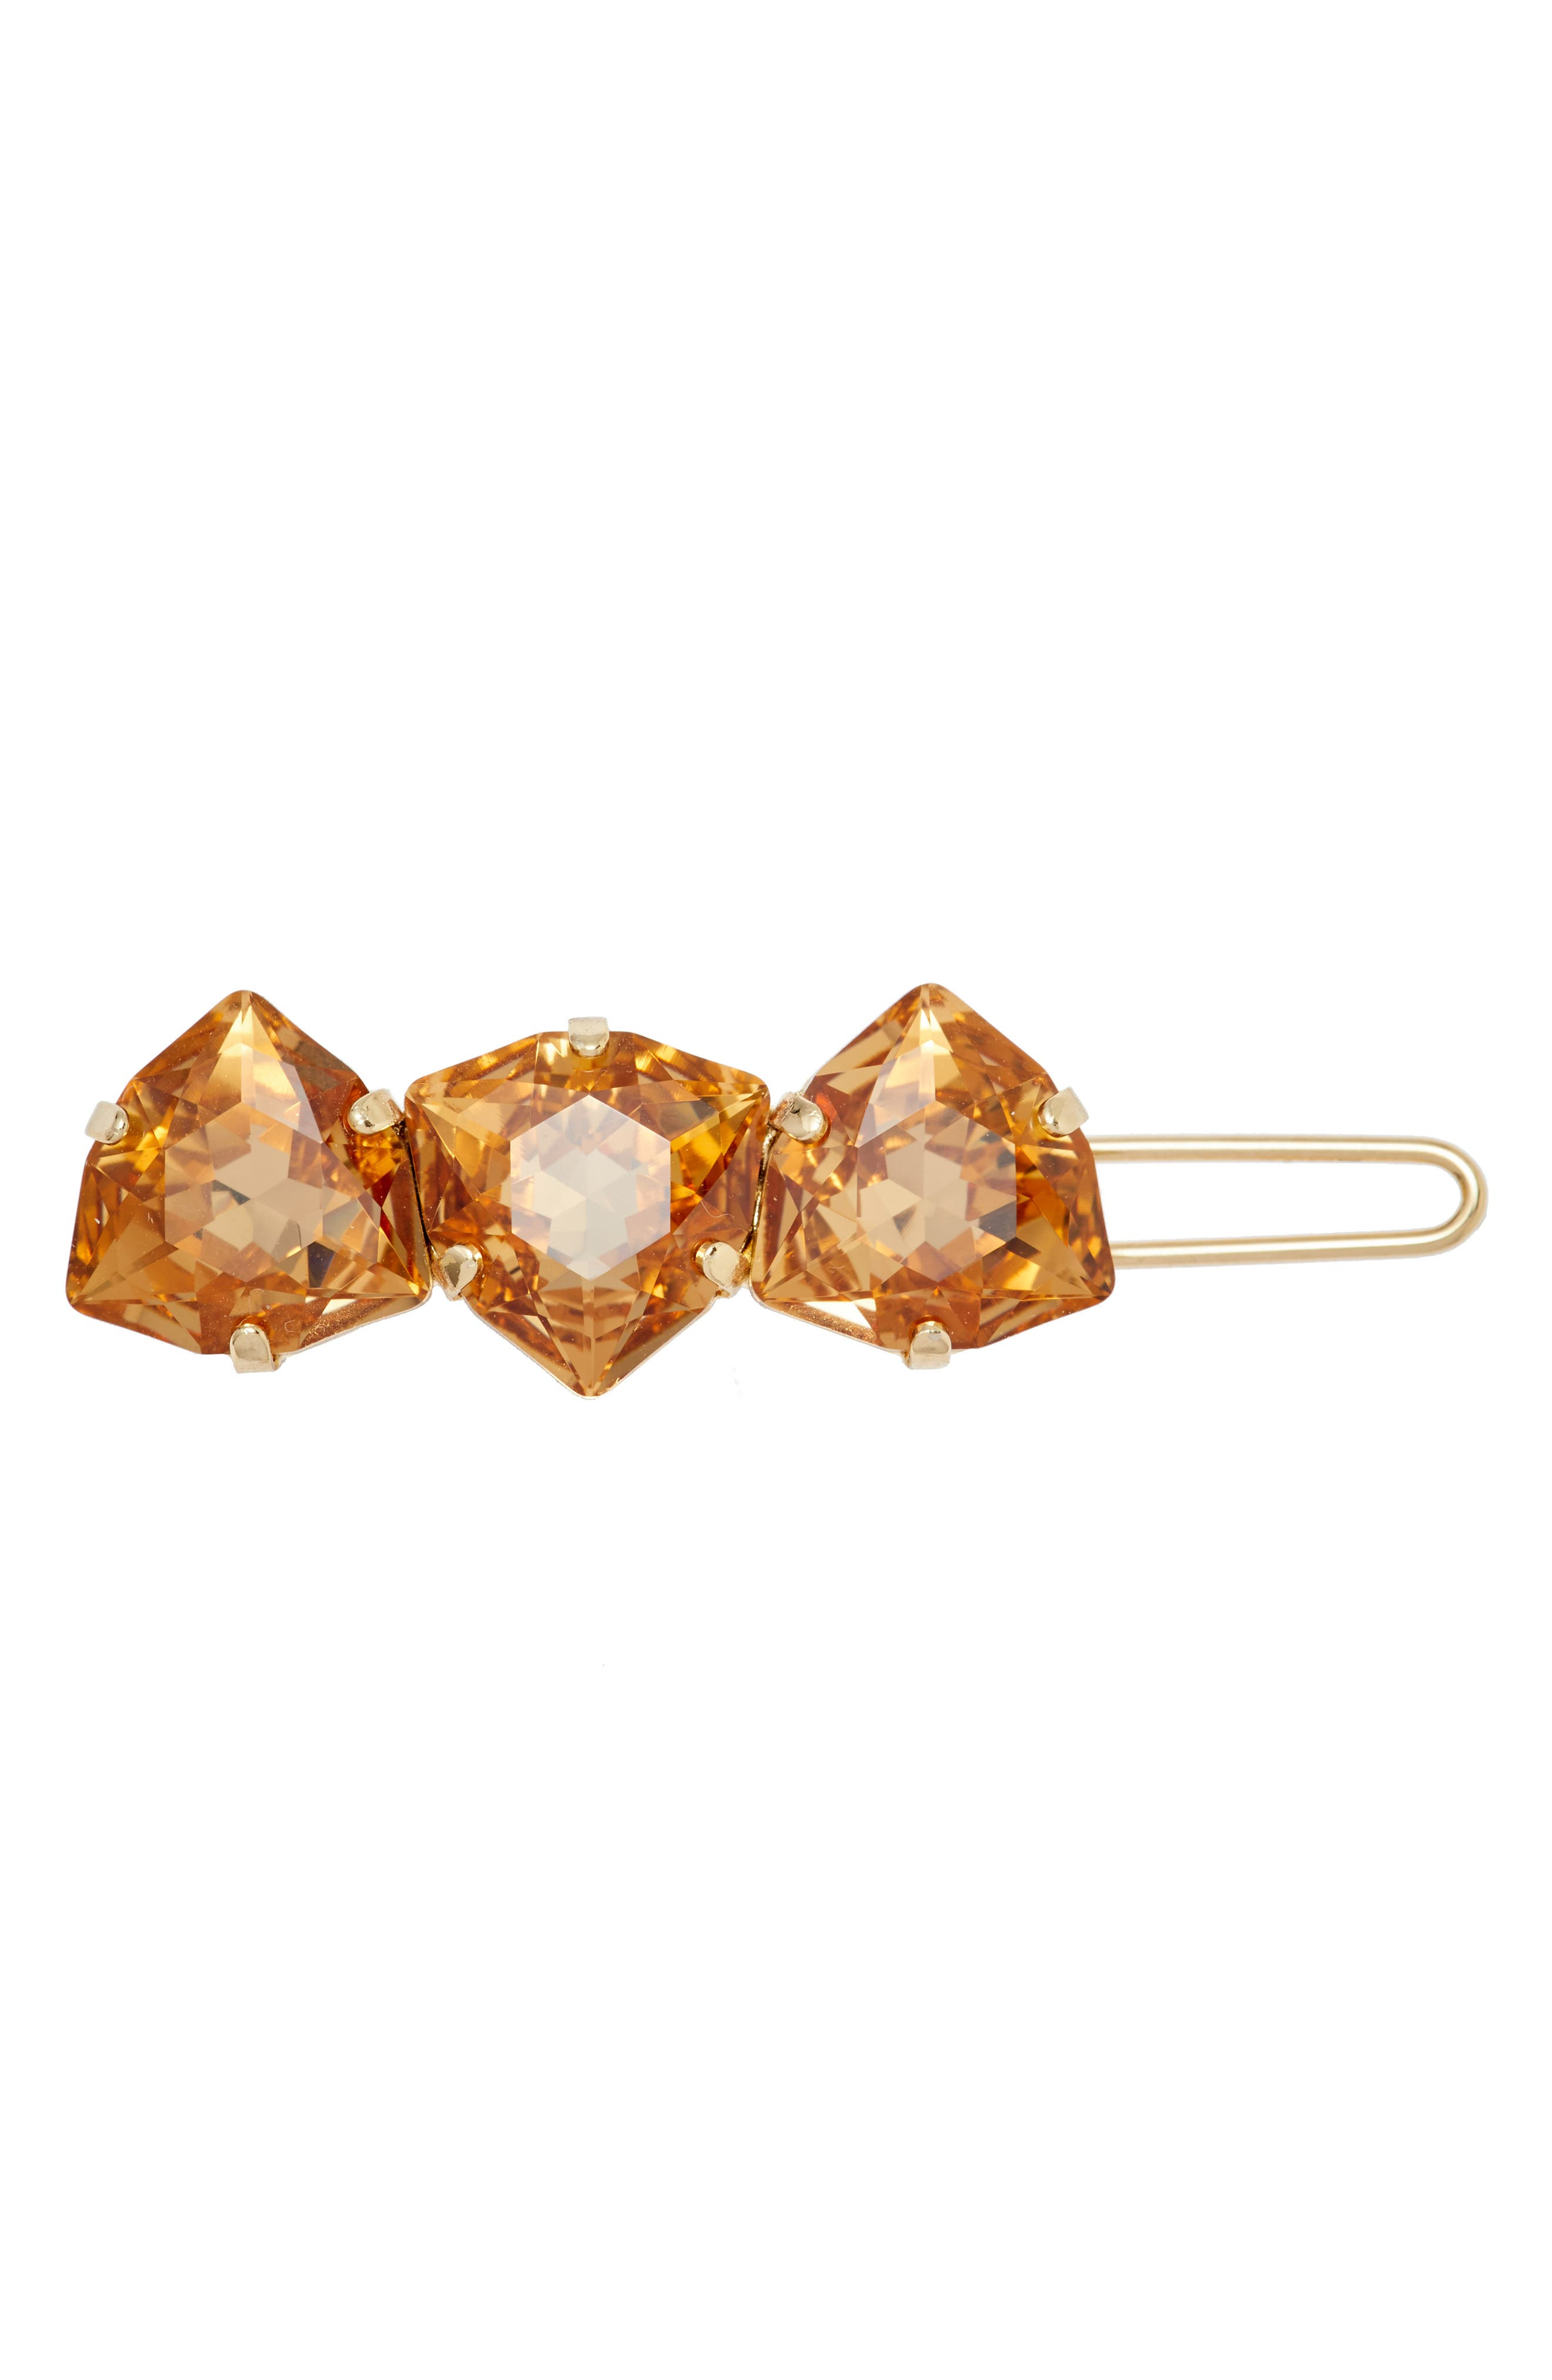 Triple Crystal Tige Boule Barrette,                             Main thumbnail 1, color,                             Light Colorado Topaz/ Gold